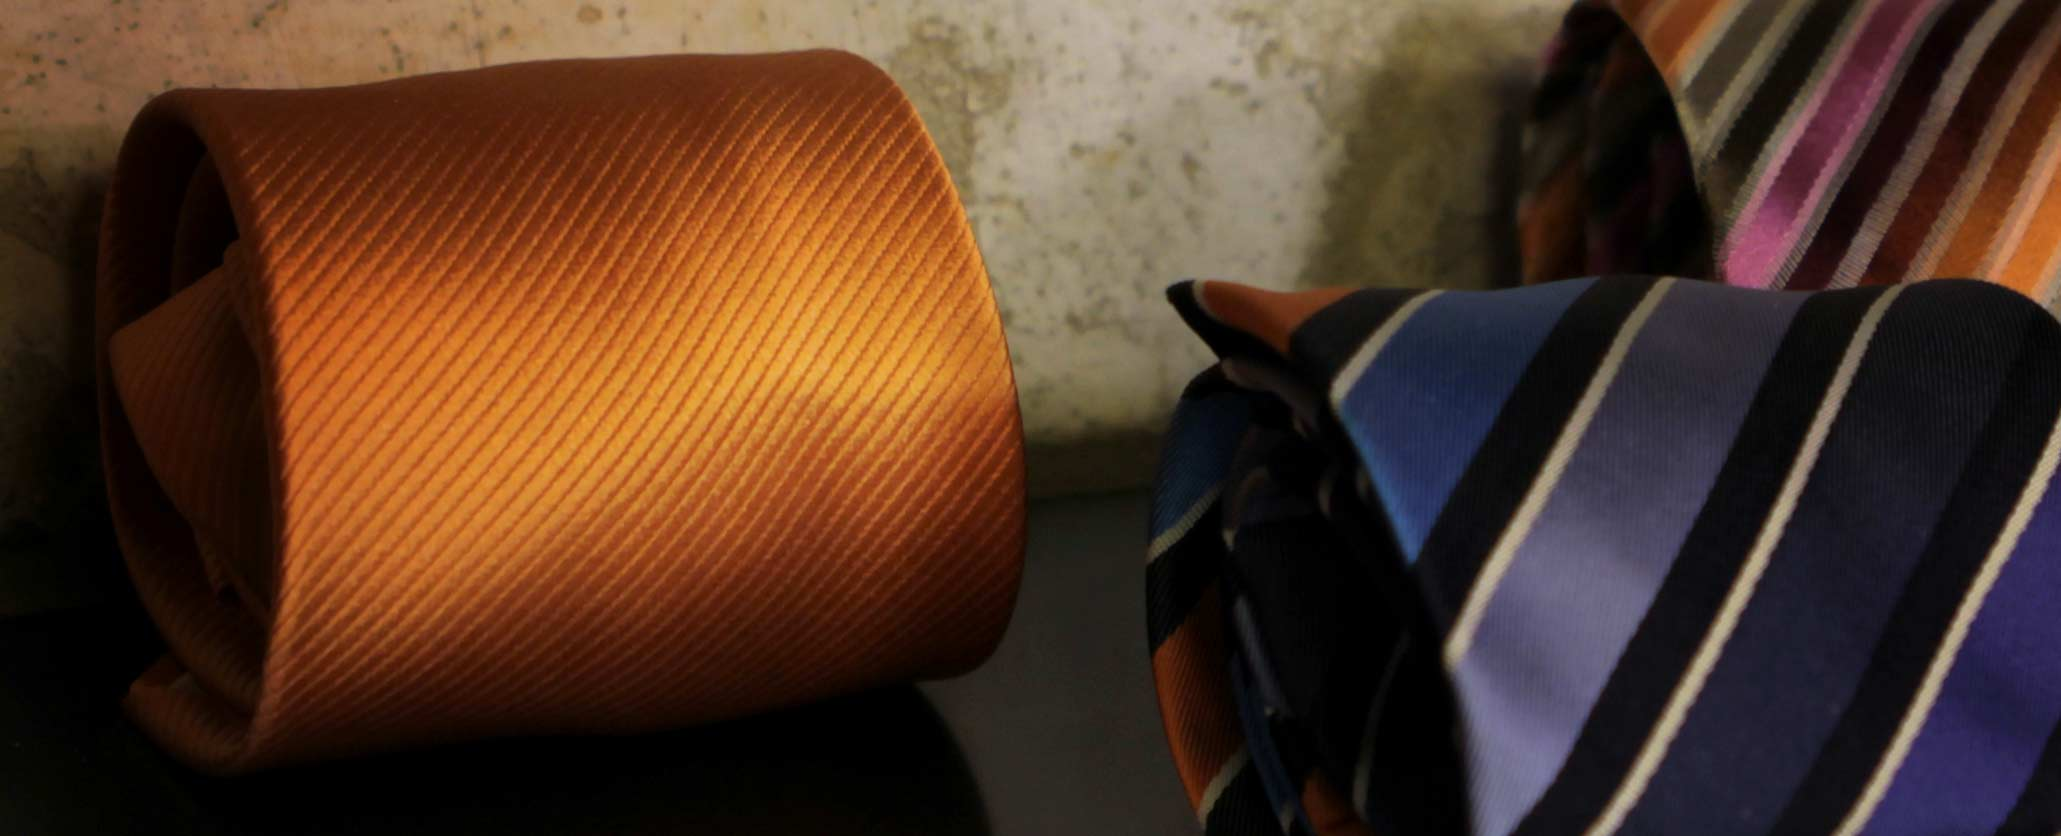 cravatte-4-torredarte